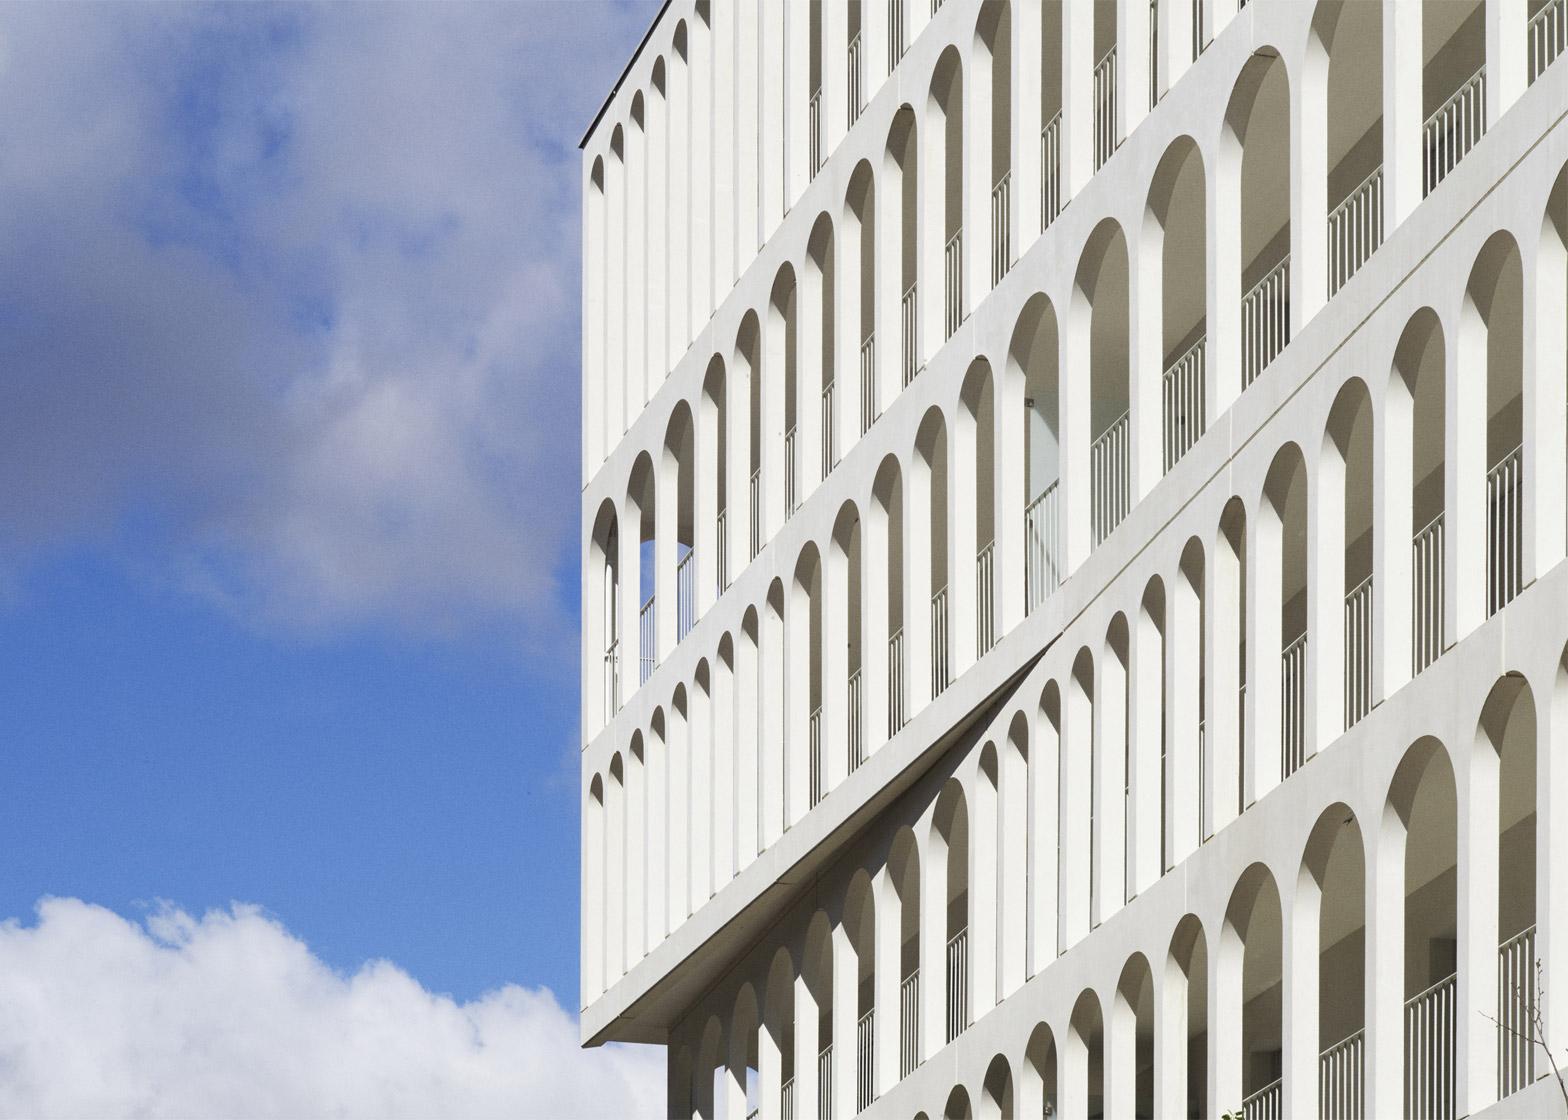 Photograph by Julien Lanoo of Arches Boulogne by Antonini Darmon, a social housing scheme in Paris, France